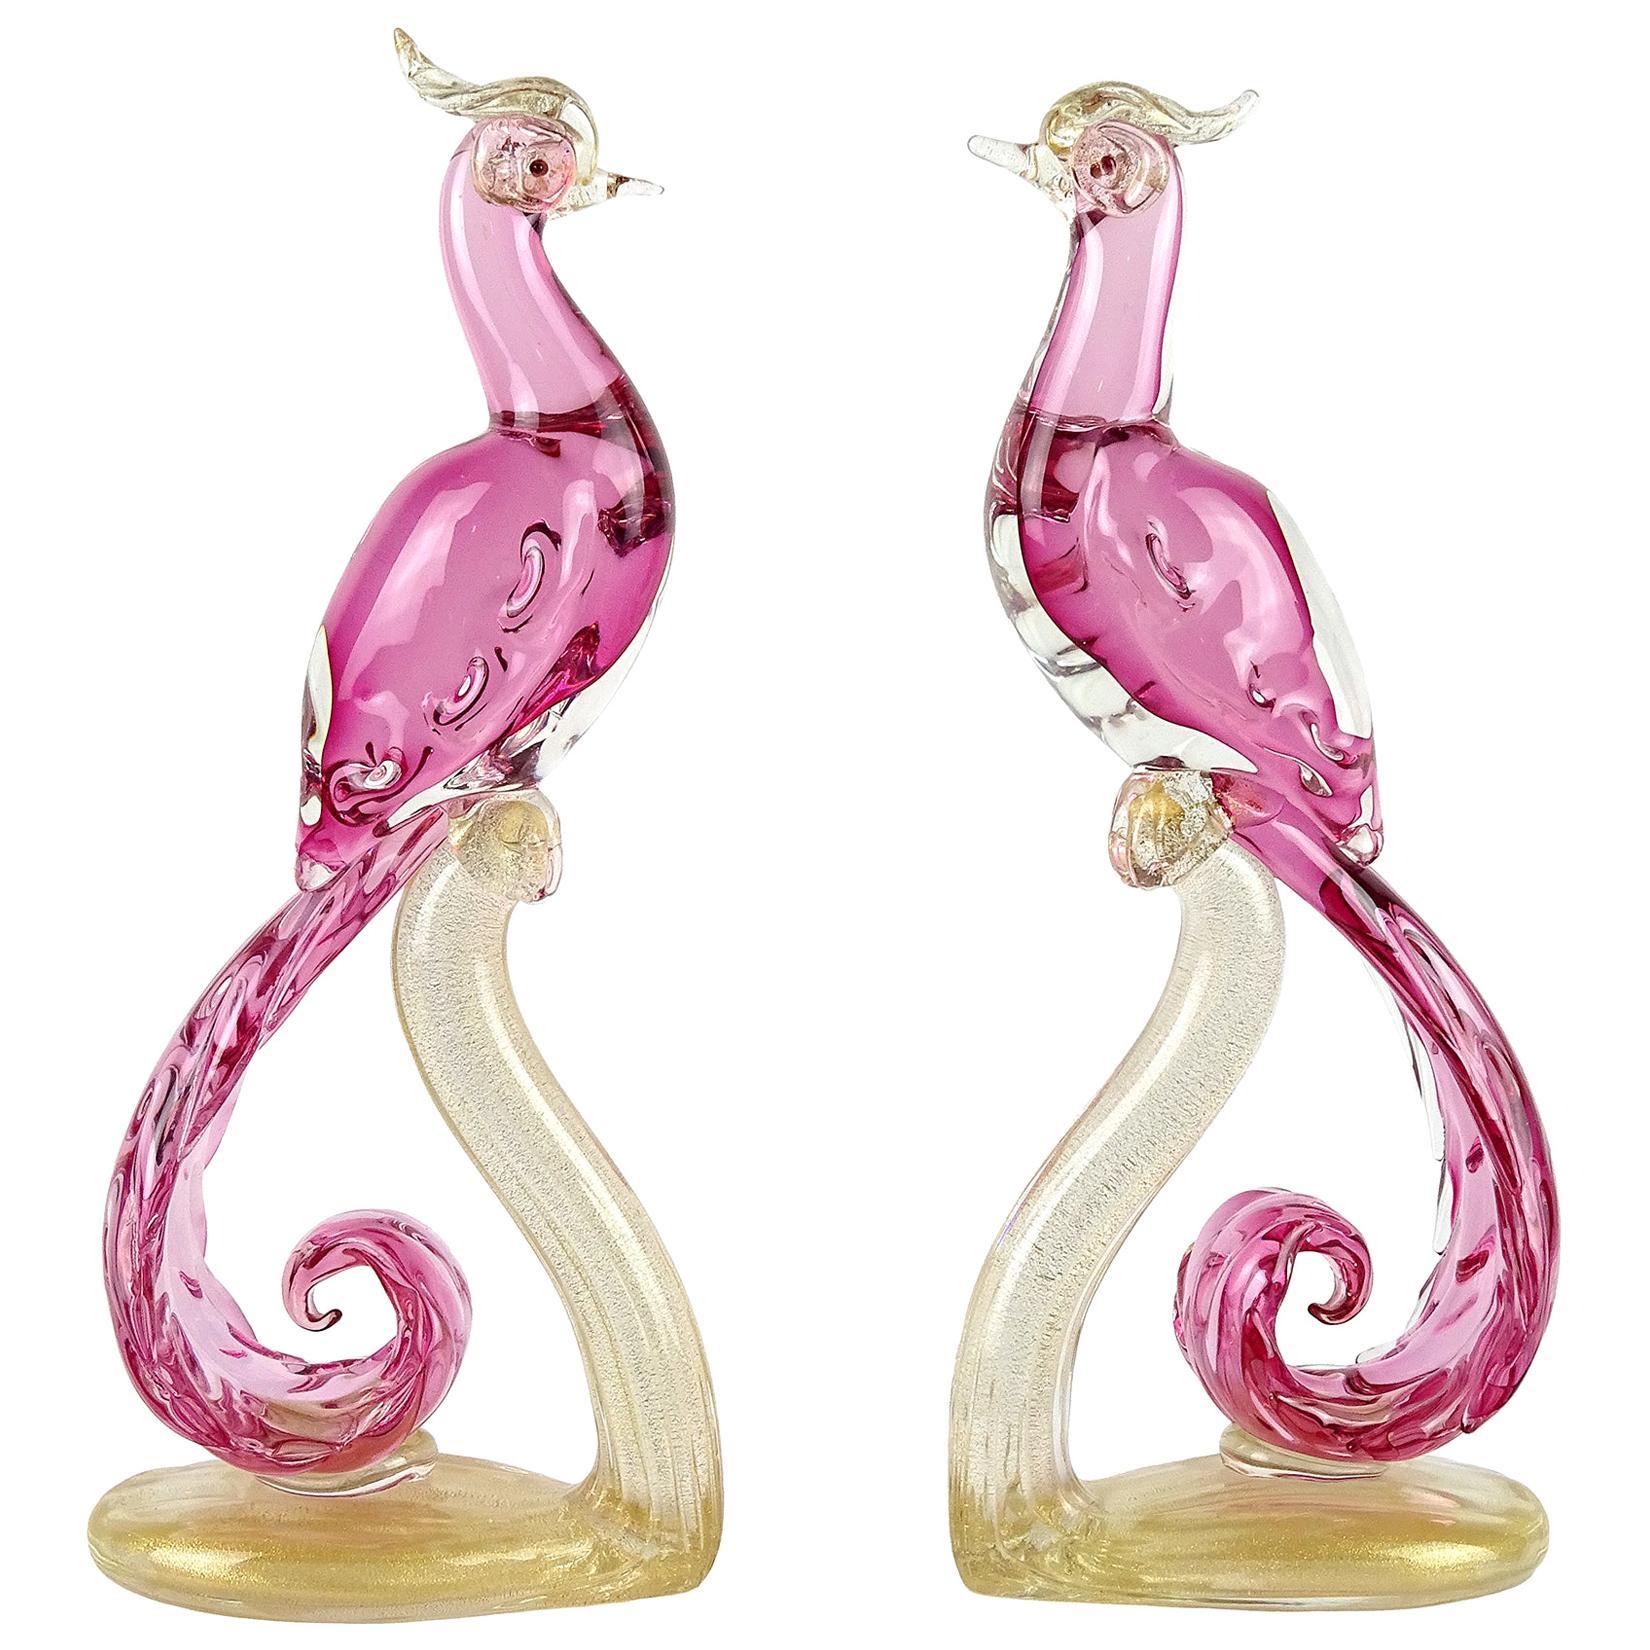 Barbini Murano Sommerso Pink Gold Italian Art Glass Pheasant Bird Sculpture Set